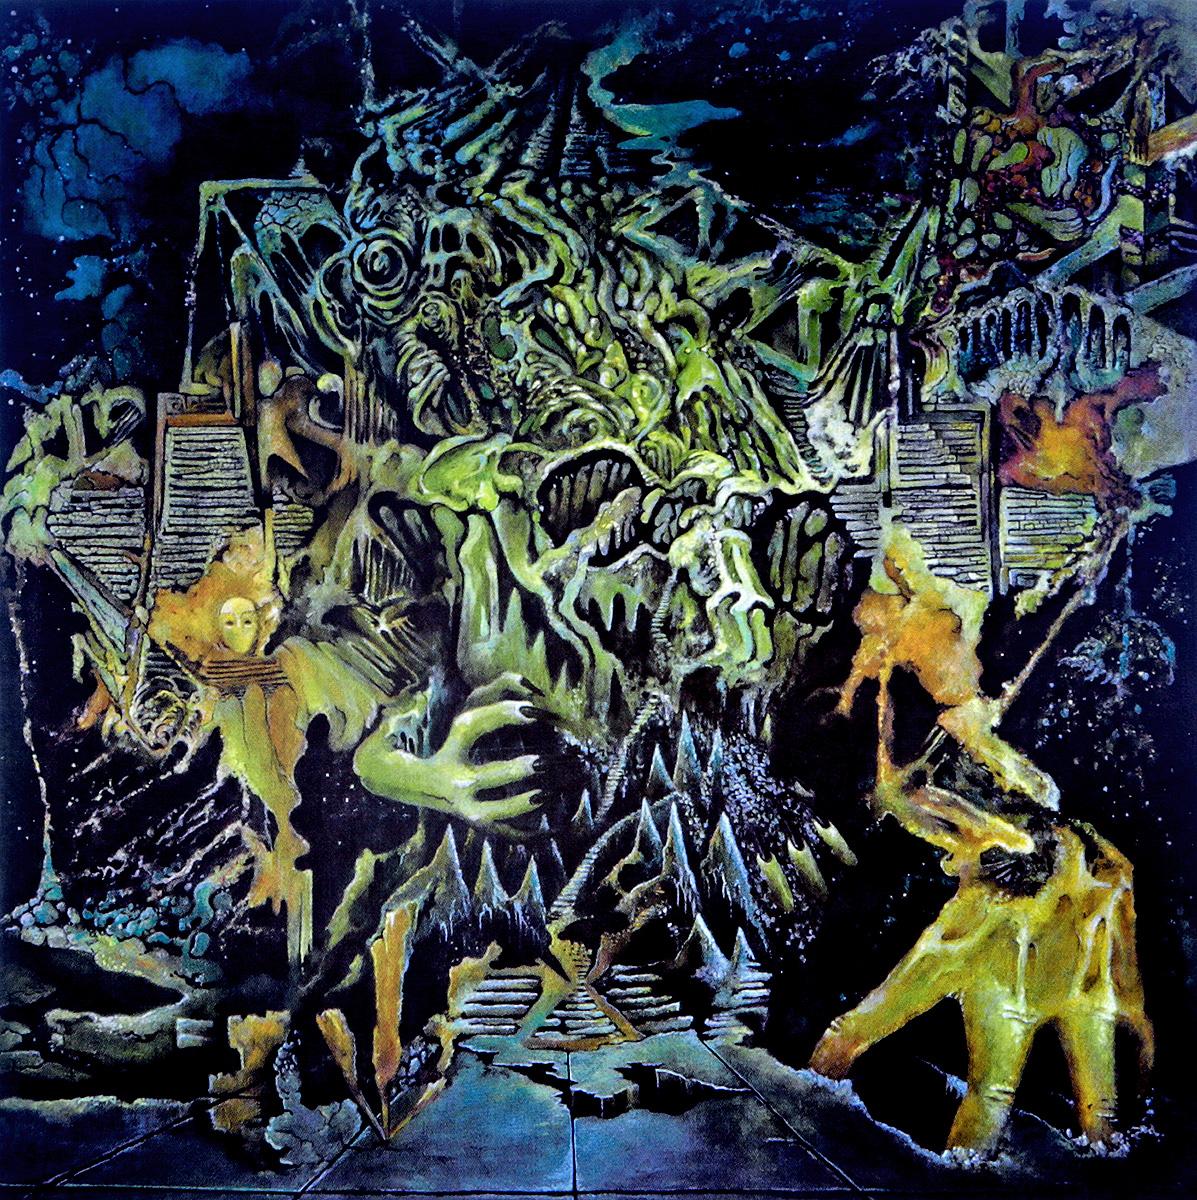 King Gizzard & The Lizard Wizard King Gizzard & The Lizard Wizard. Murder Of The Universe автокресло gb idan lizard khaki